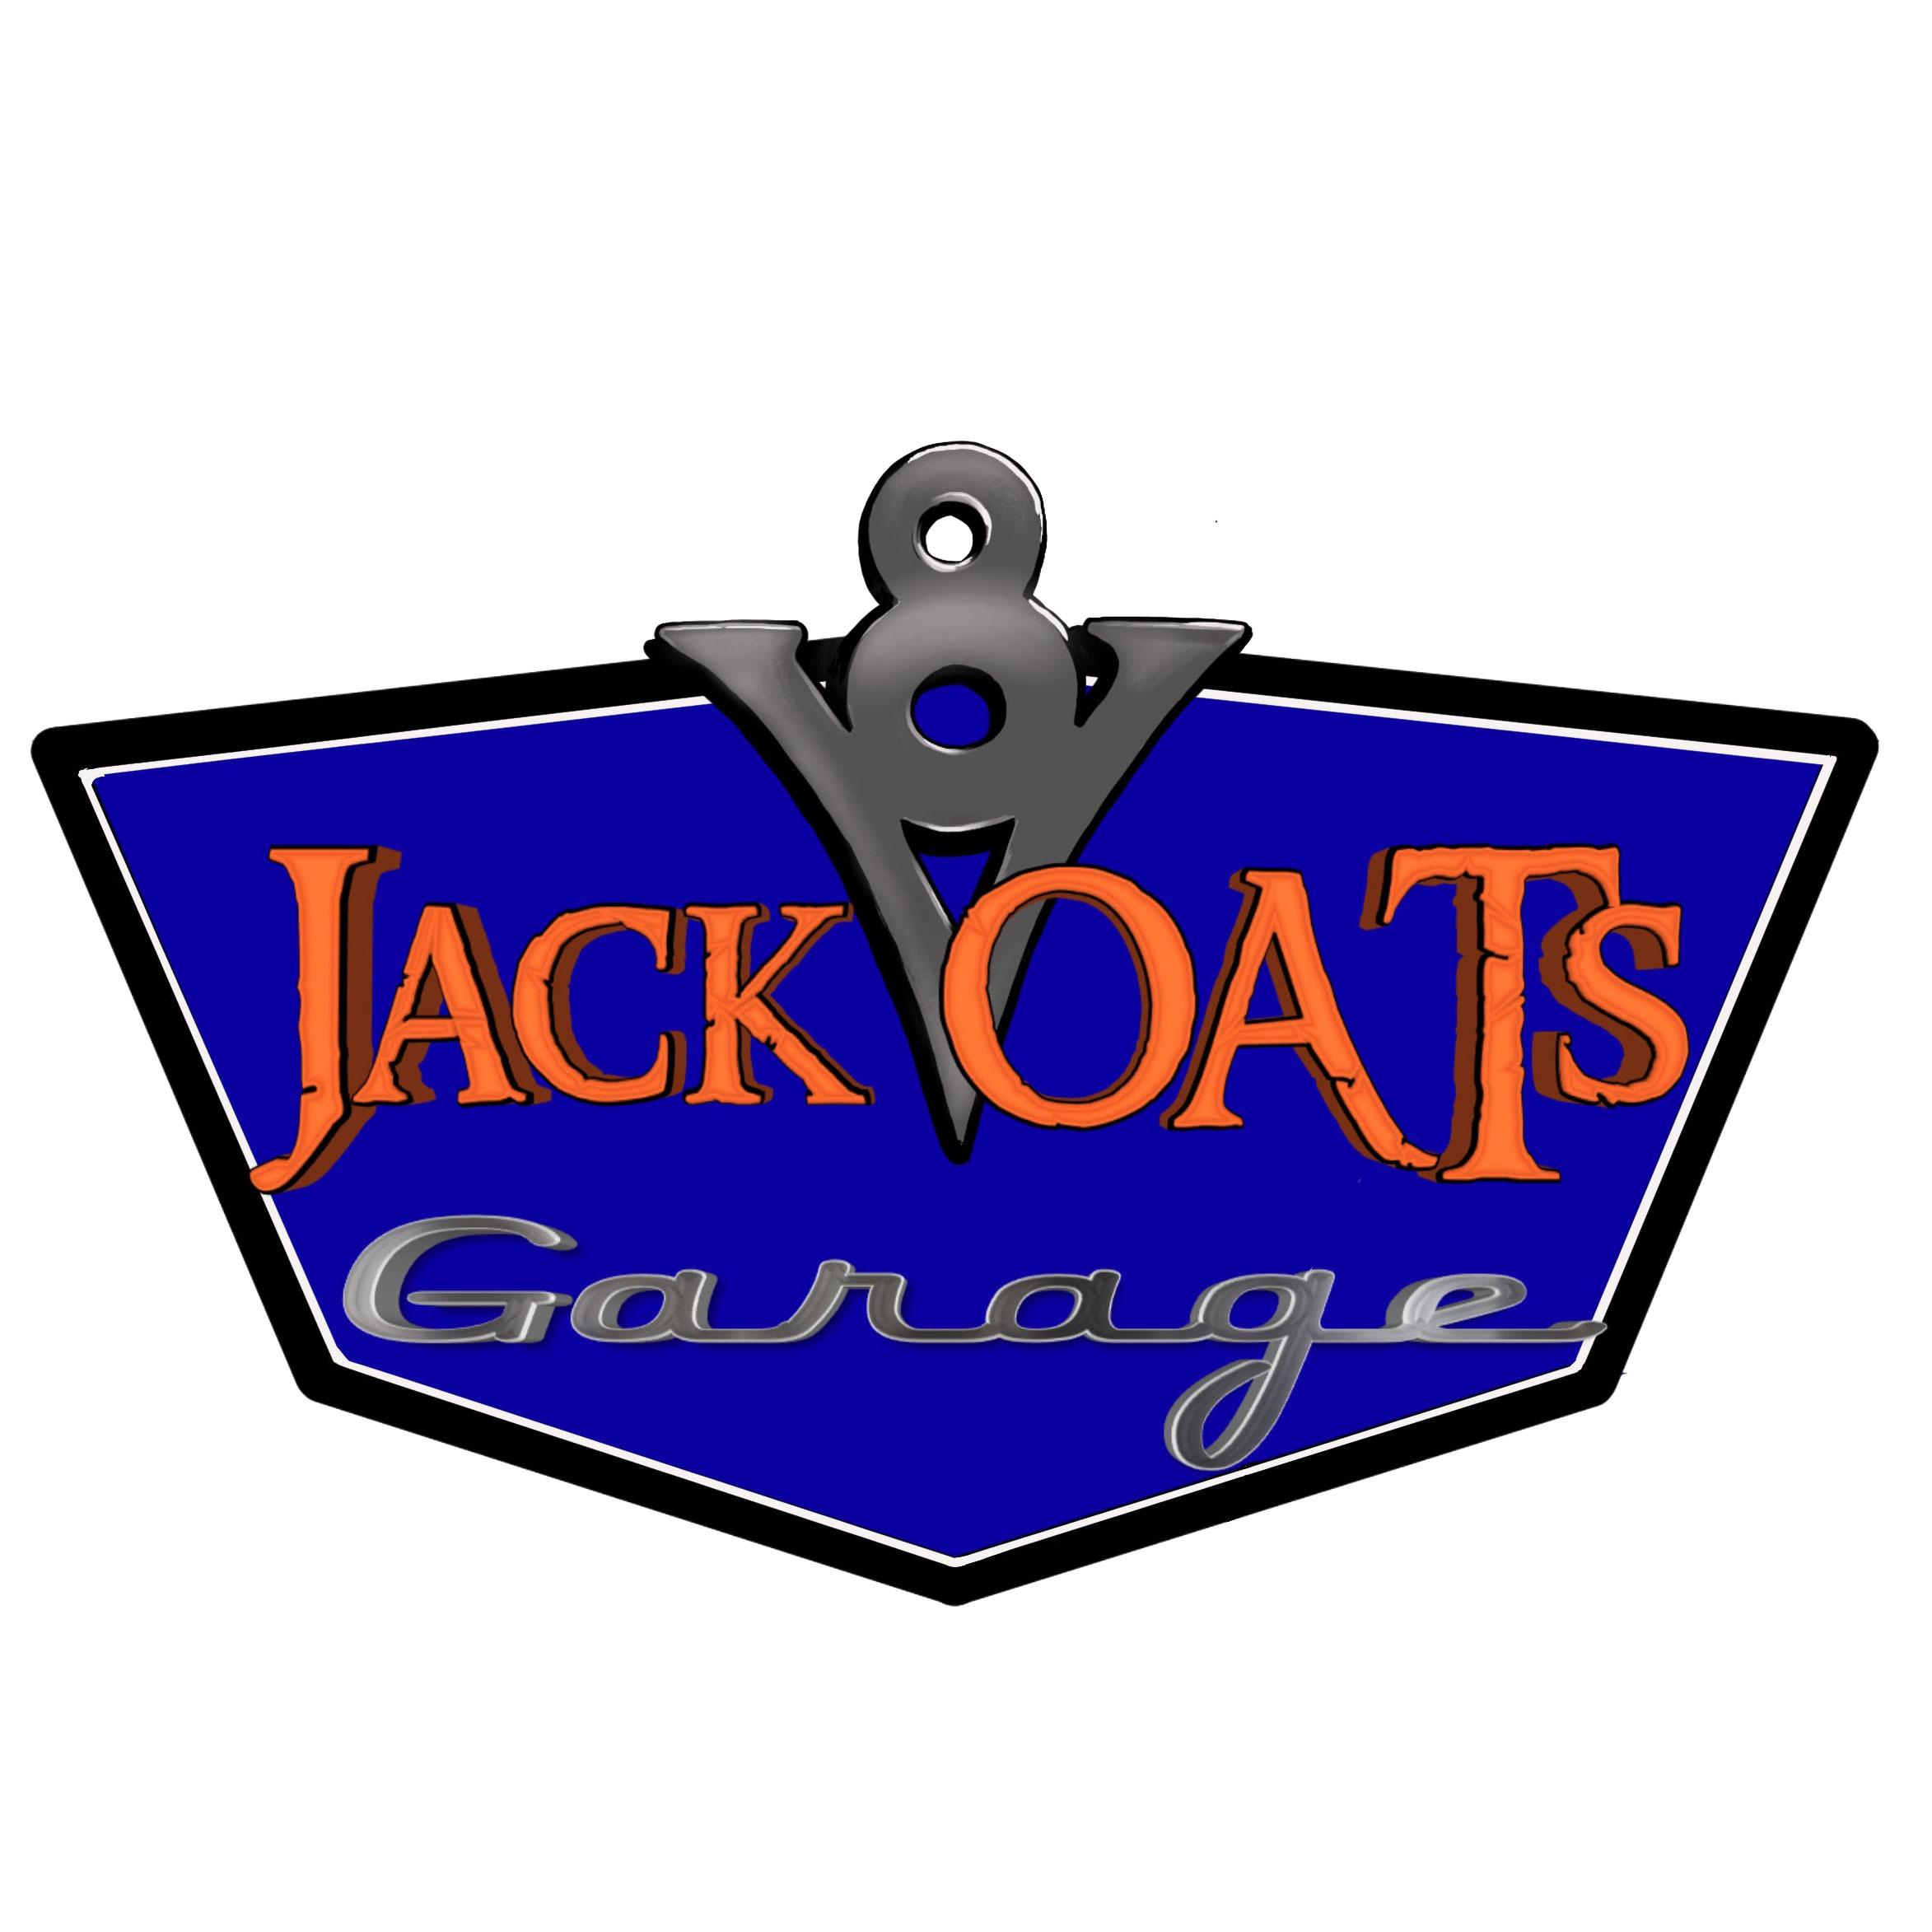 Jack Oat's V8 Garage Winthrop WA